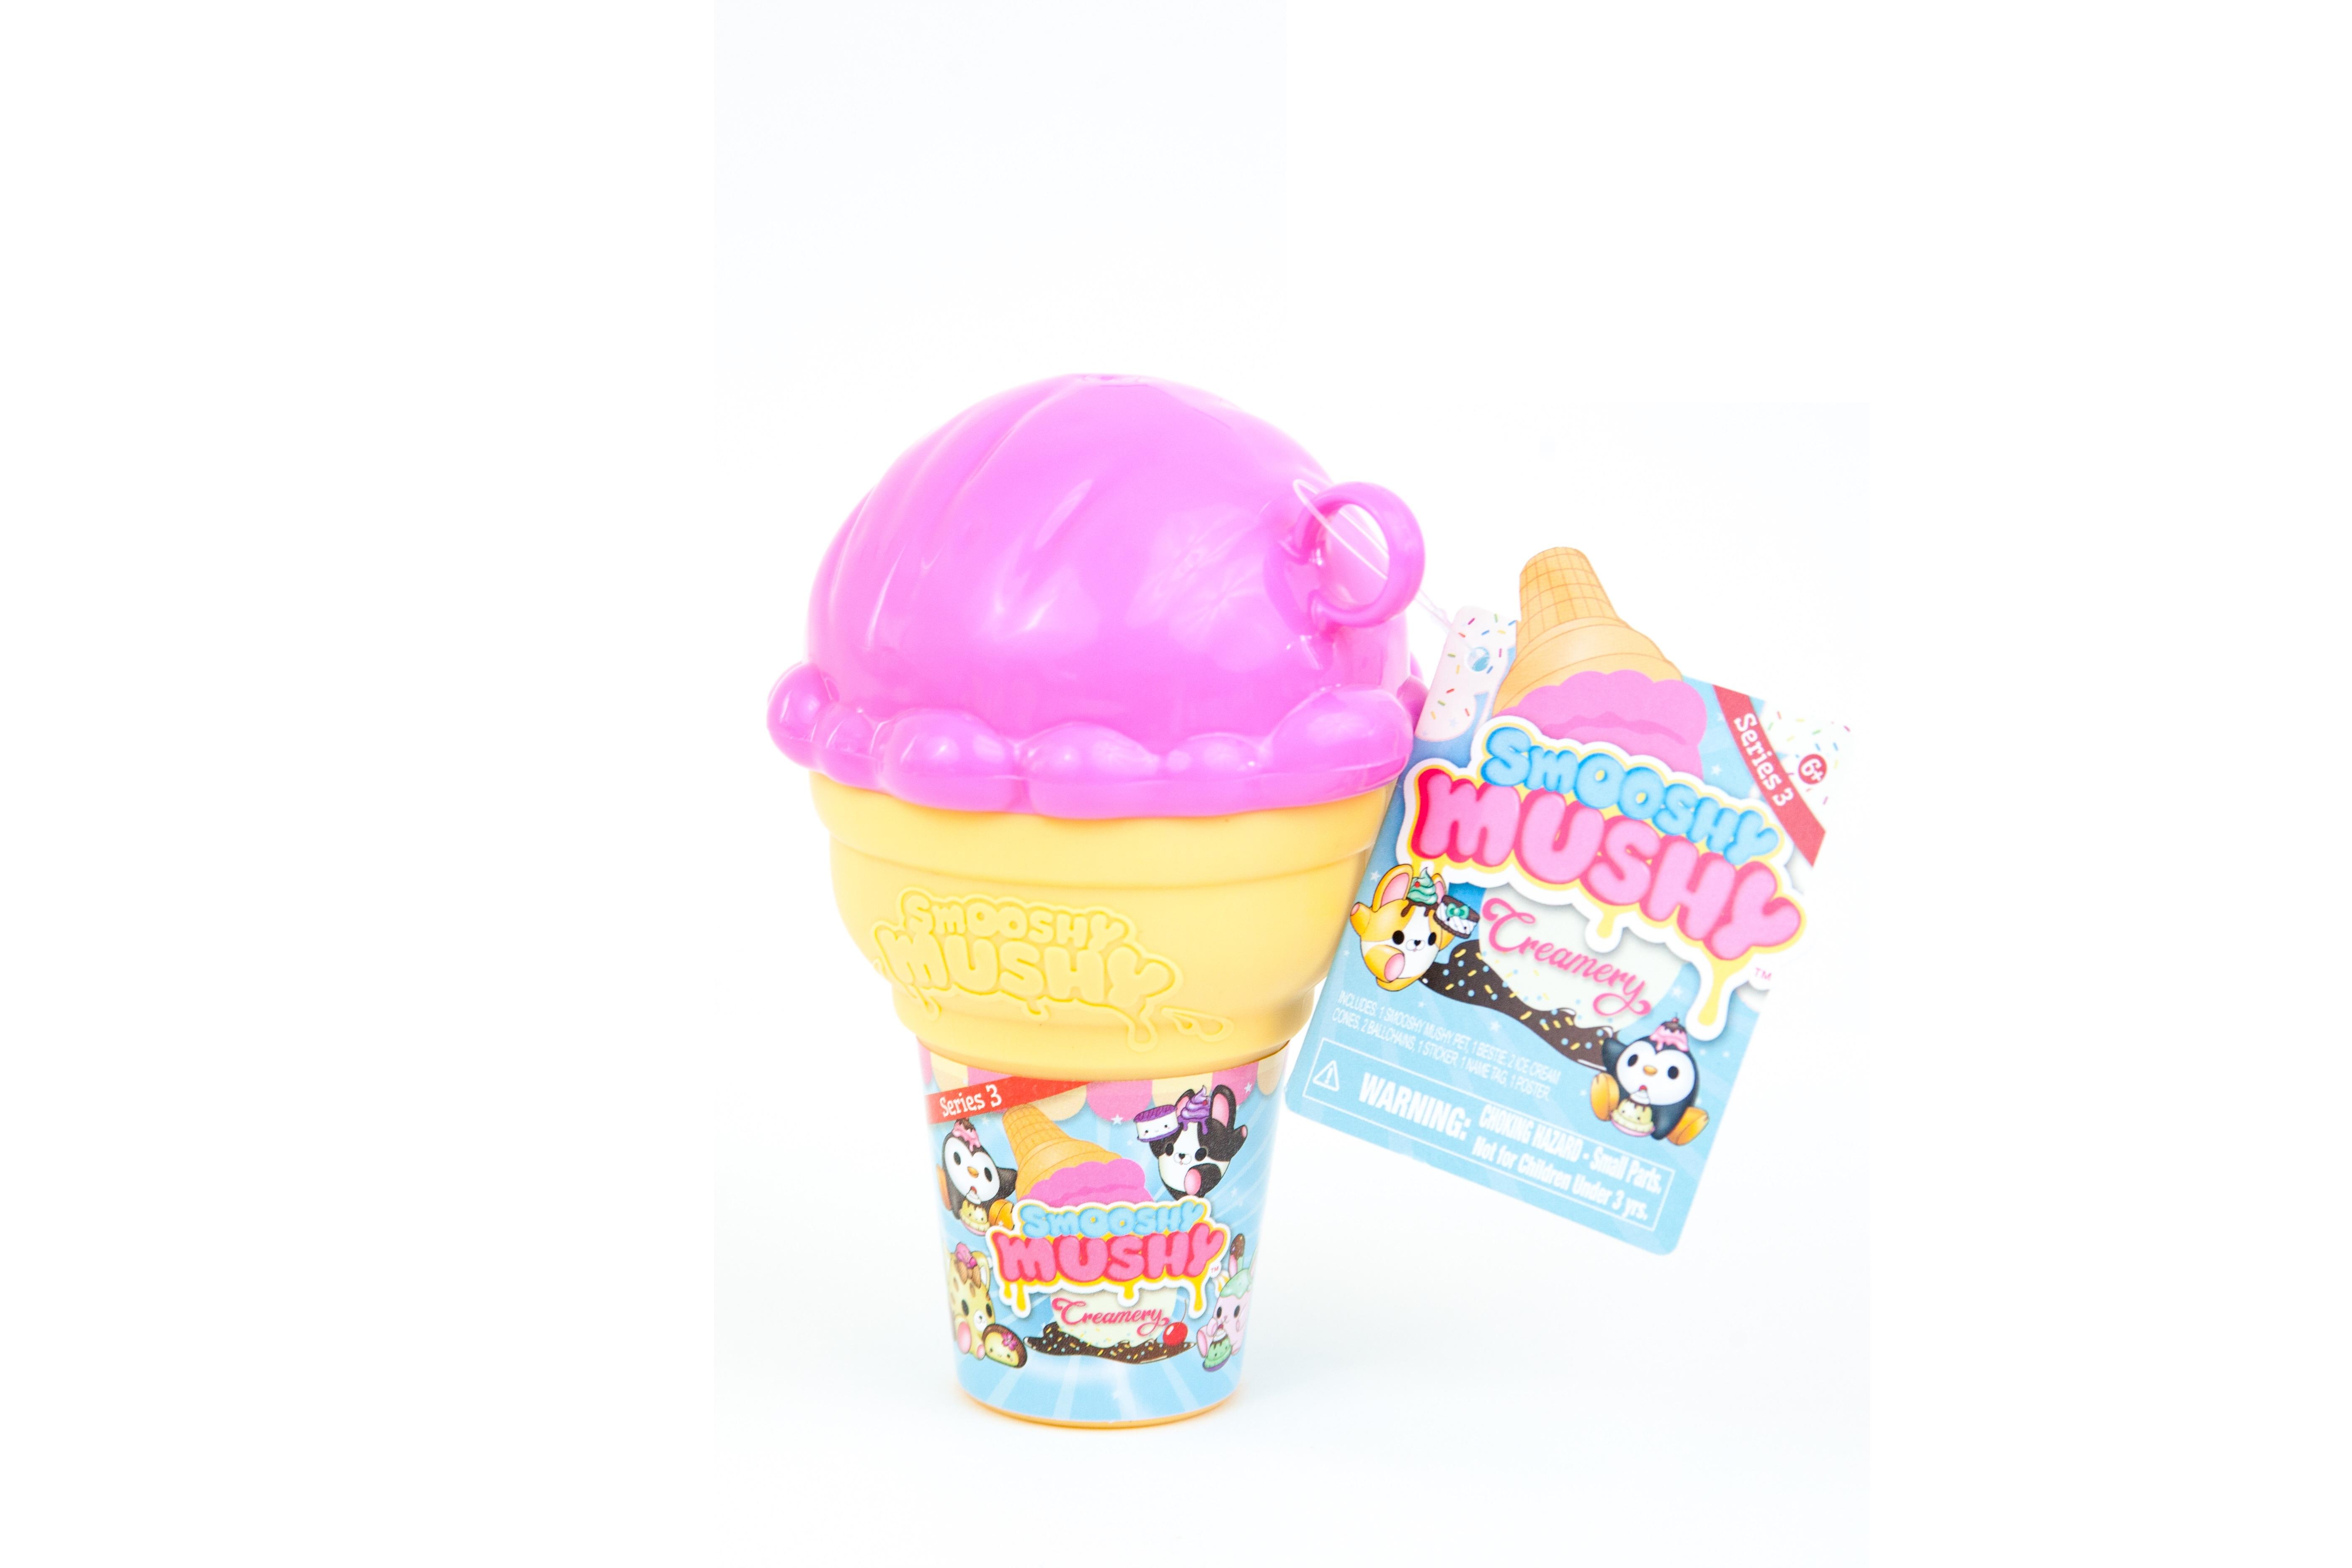 Игрушка Smooshy Mushy «Питомец» 3 серия smooshy mushy игрушка антистресс smooshy mushy core питомец 2 серия